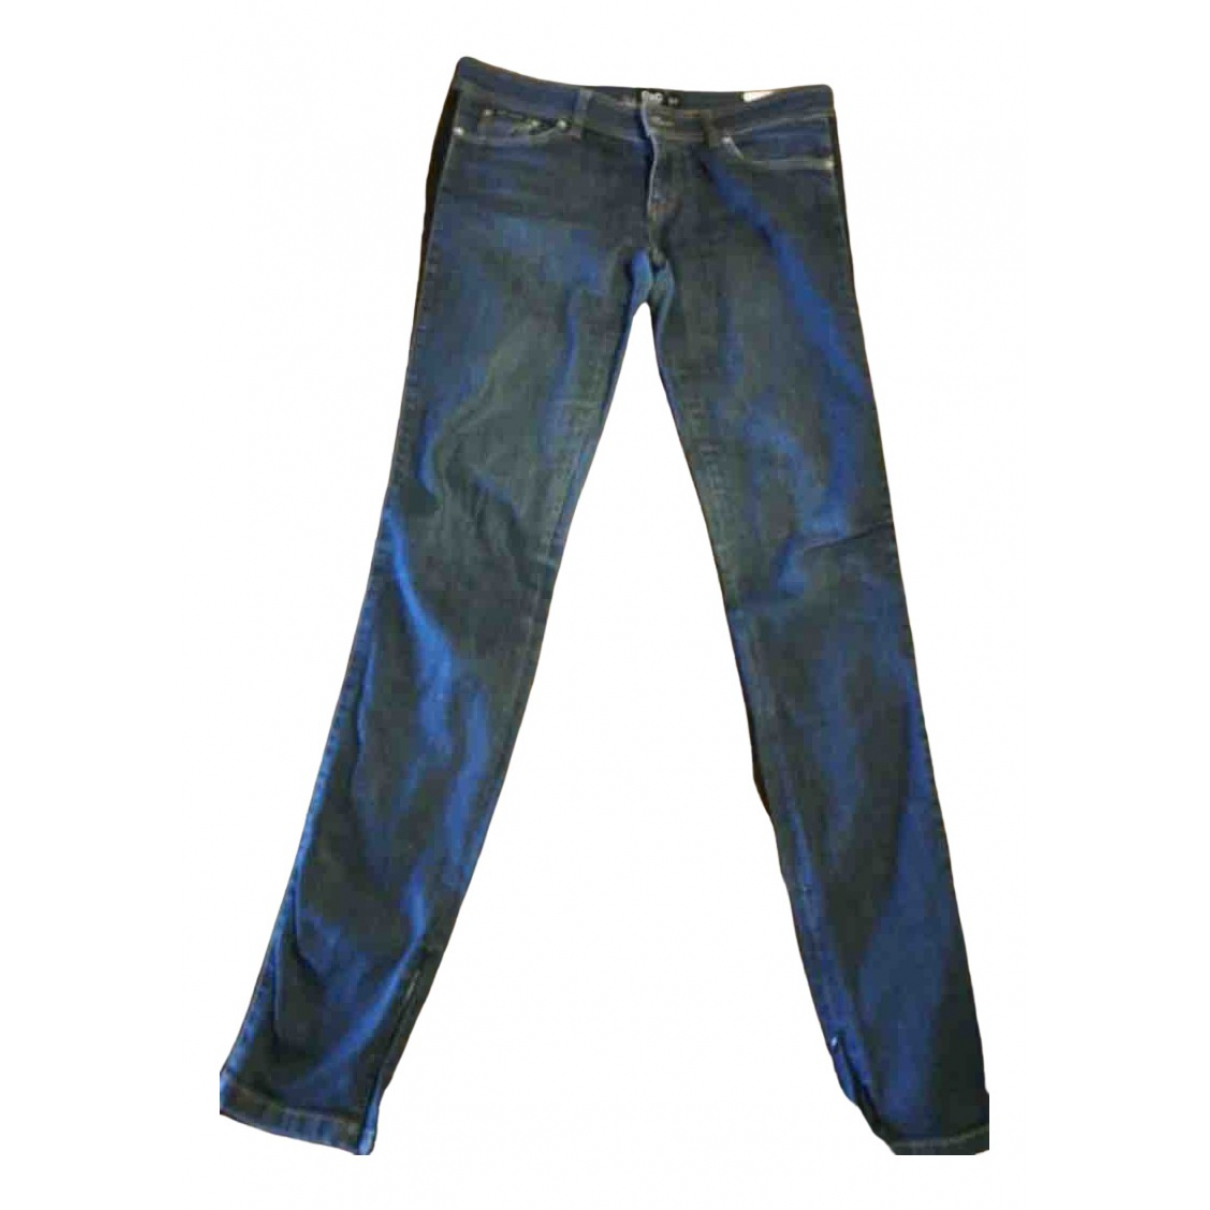 D&g N Blue Denim - Jeans Jeans for Women 42 FR